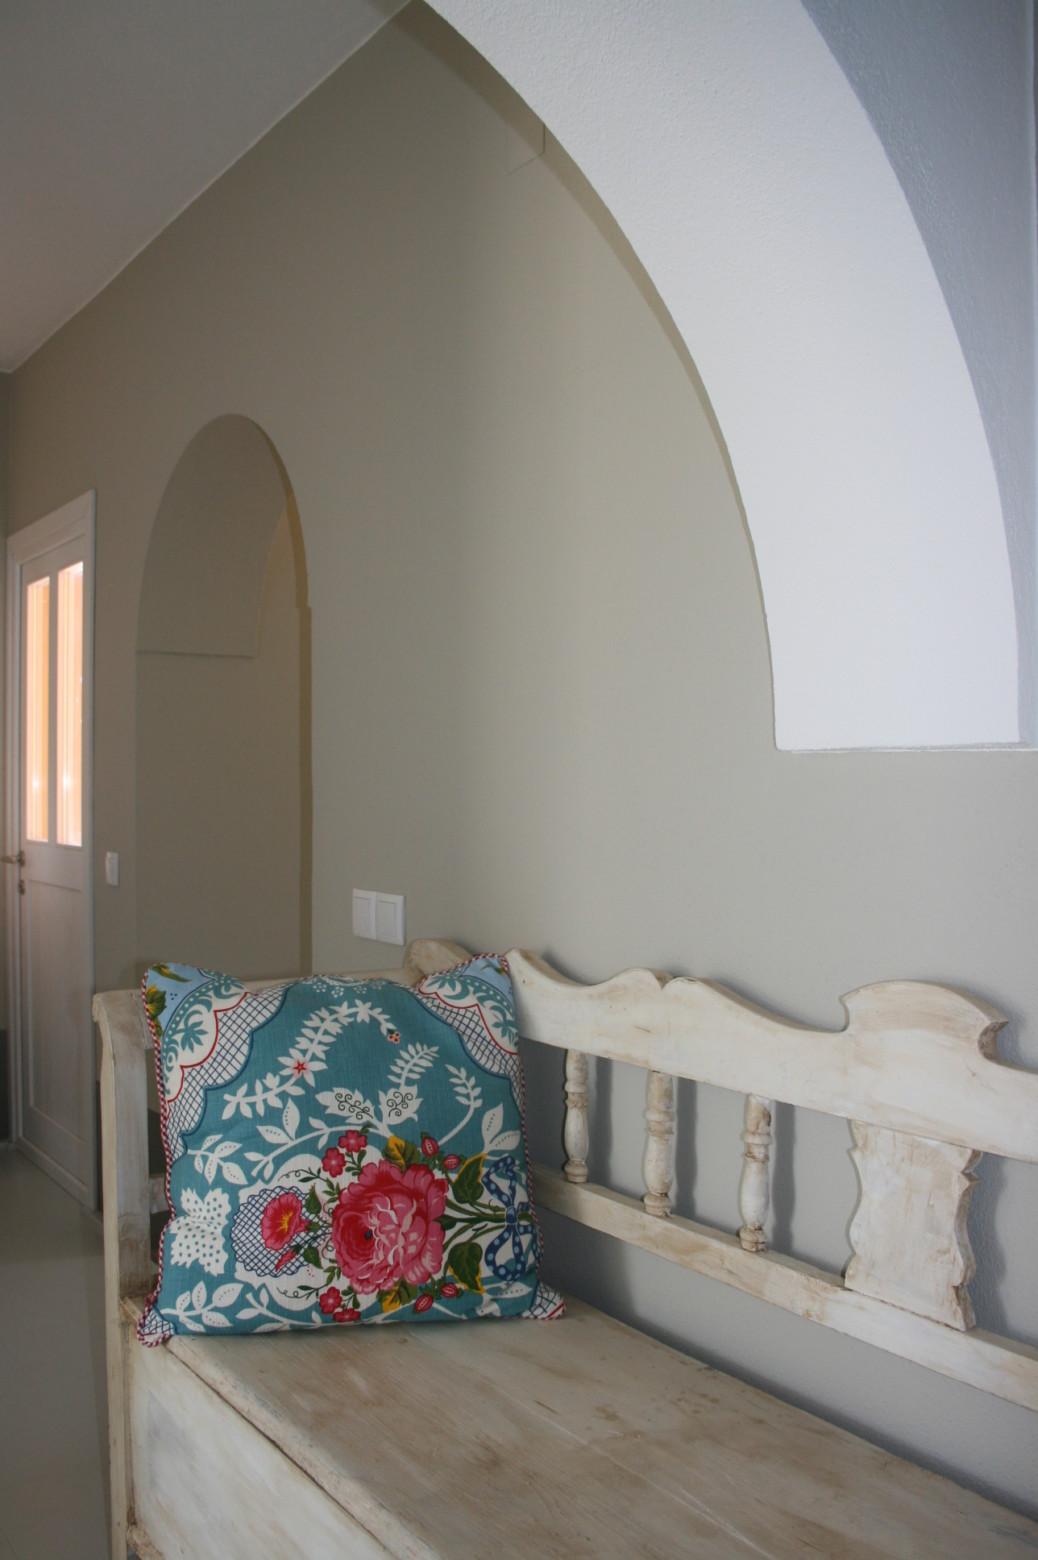 conseils dcoration d intrieur elegant conseil deco interieur on decoration d moderne idee. Black Bedroom Furniture Sets. Home Design Ideas